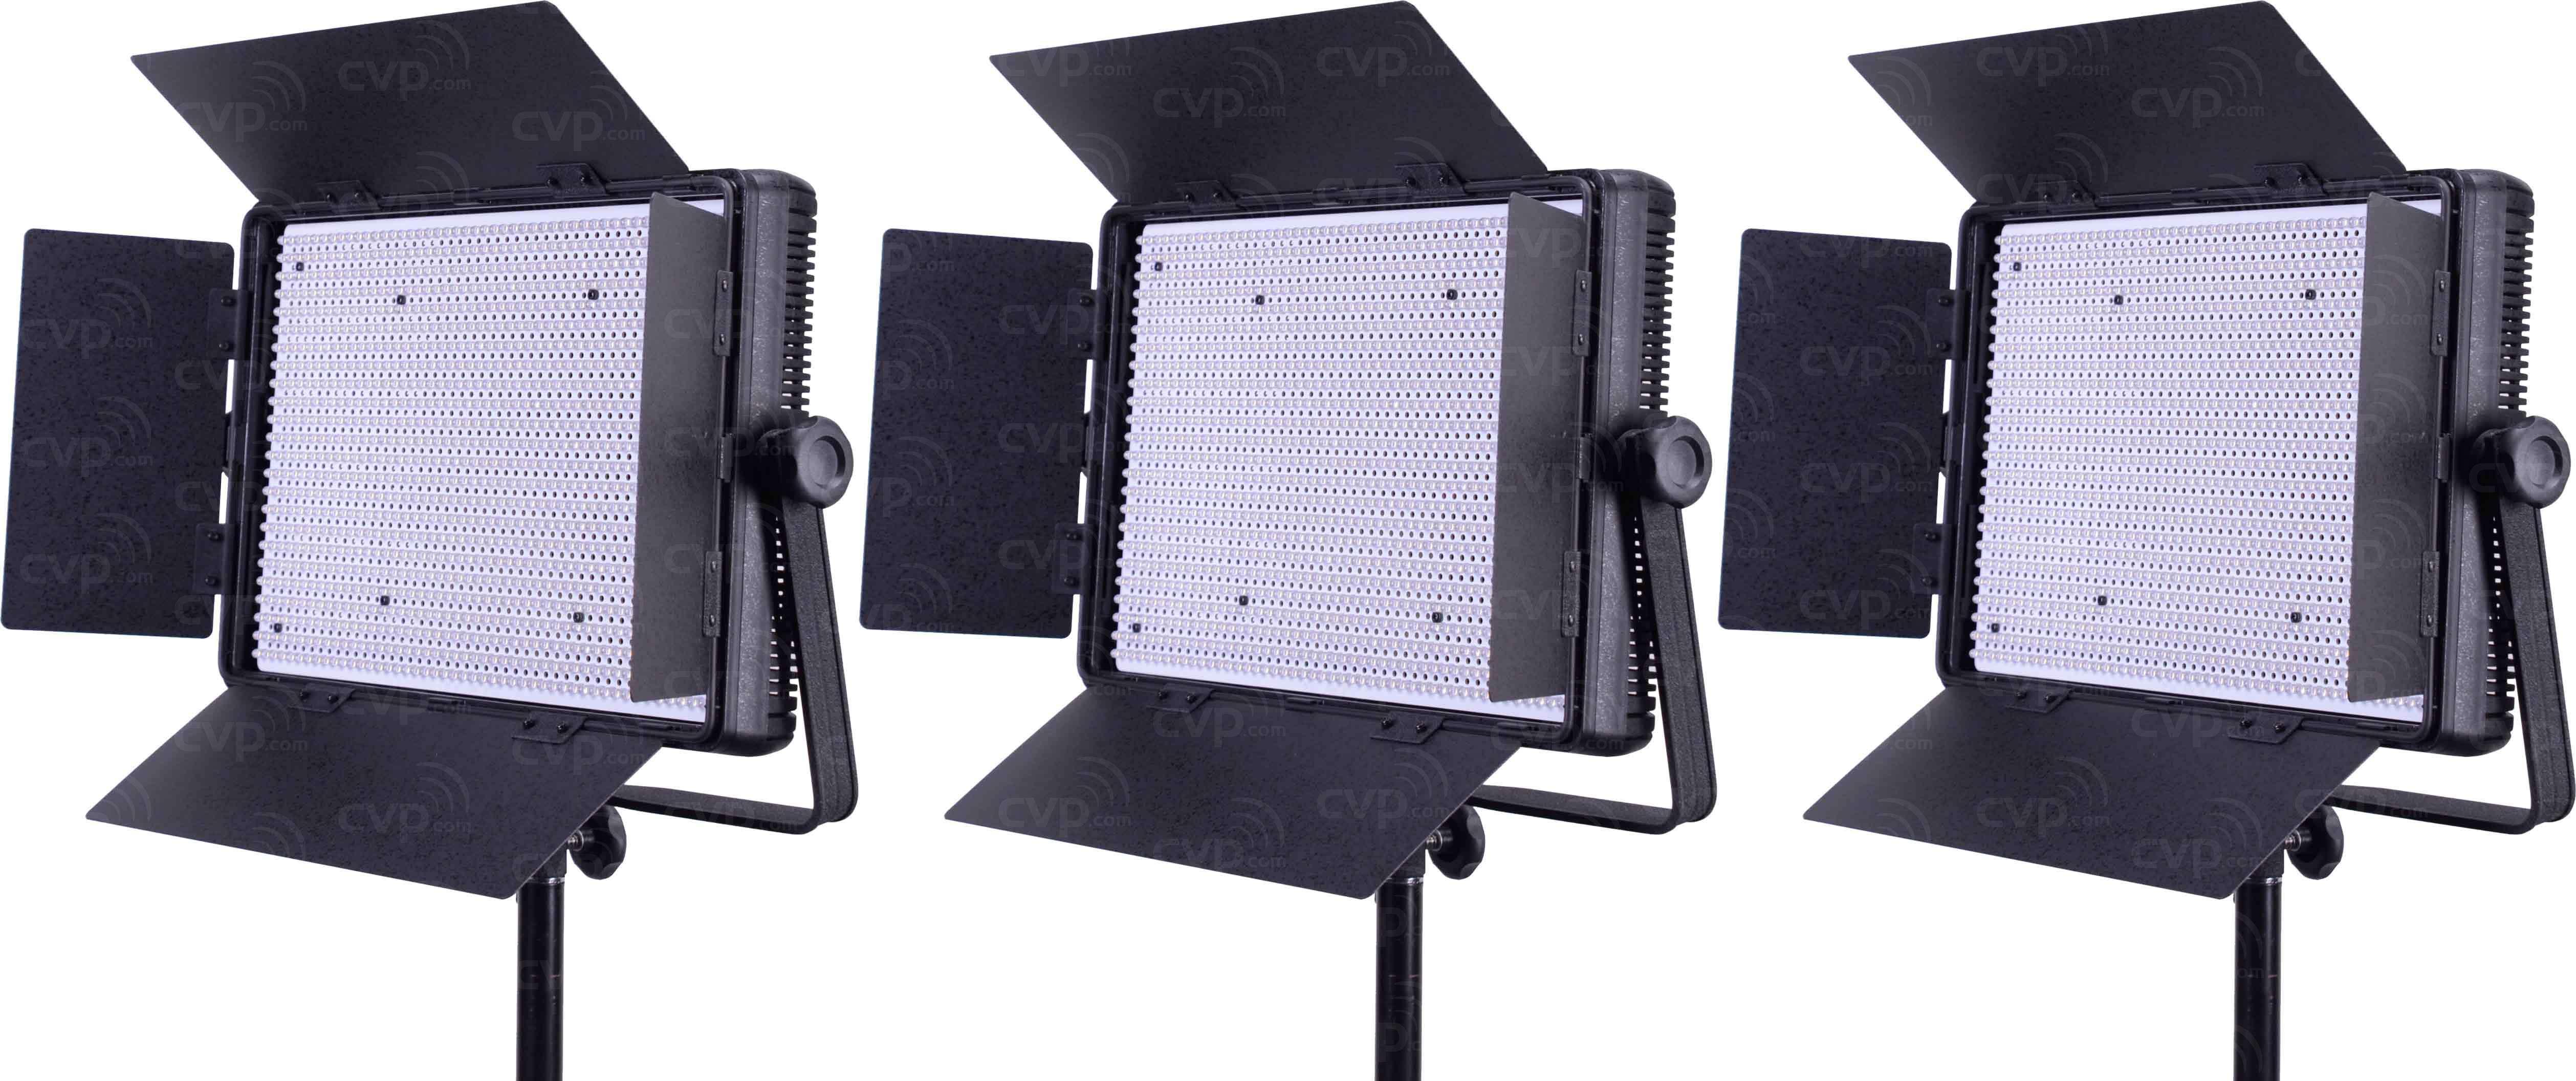 LEDGO LG-1200LK3 Daylight Kit